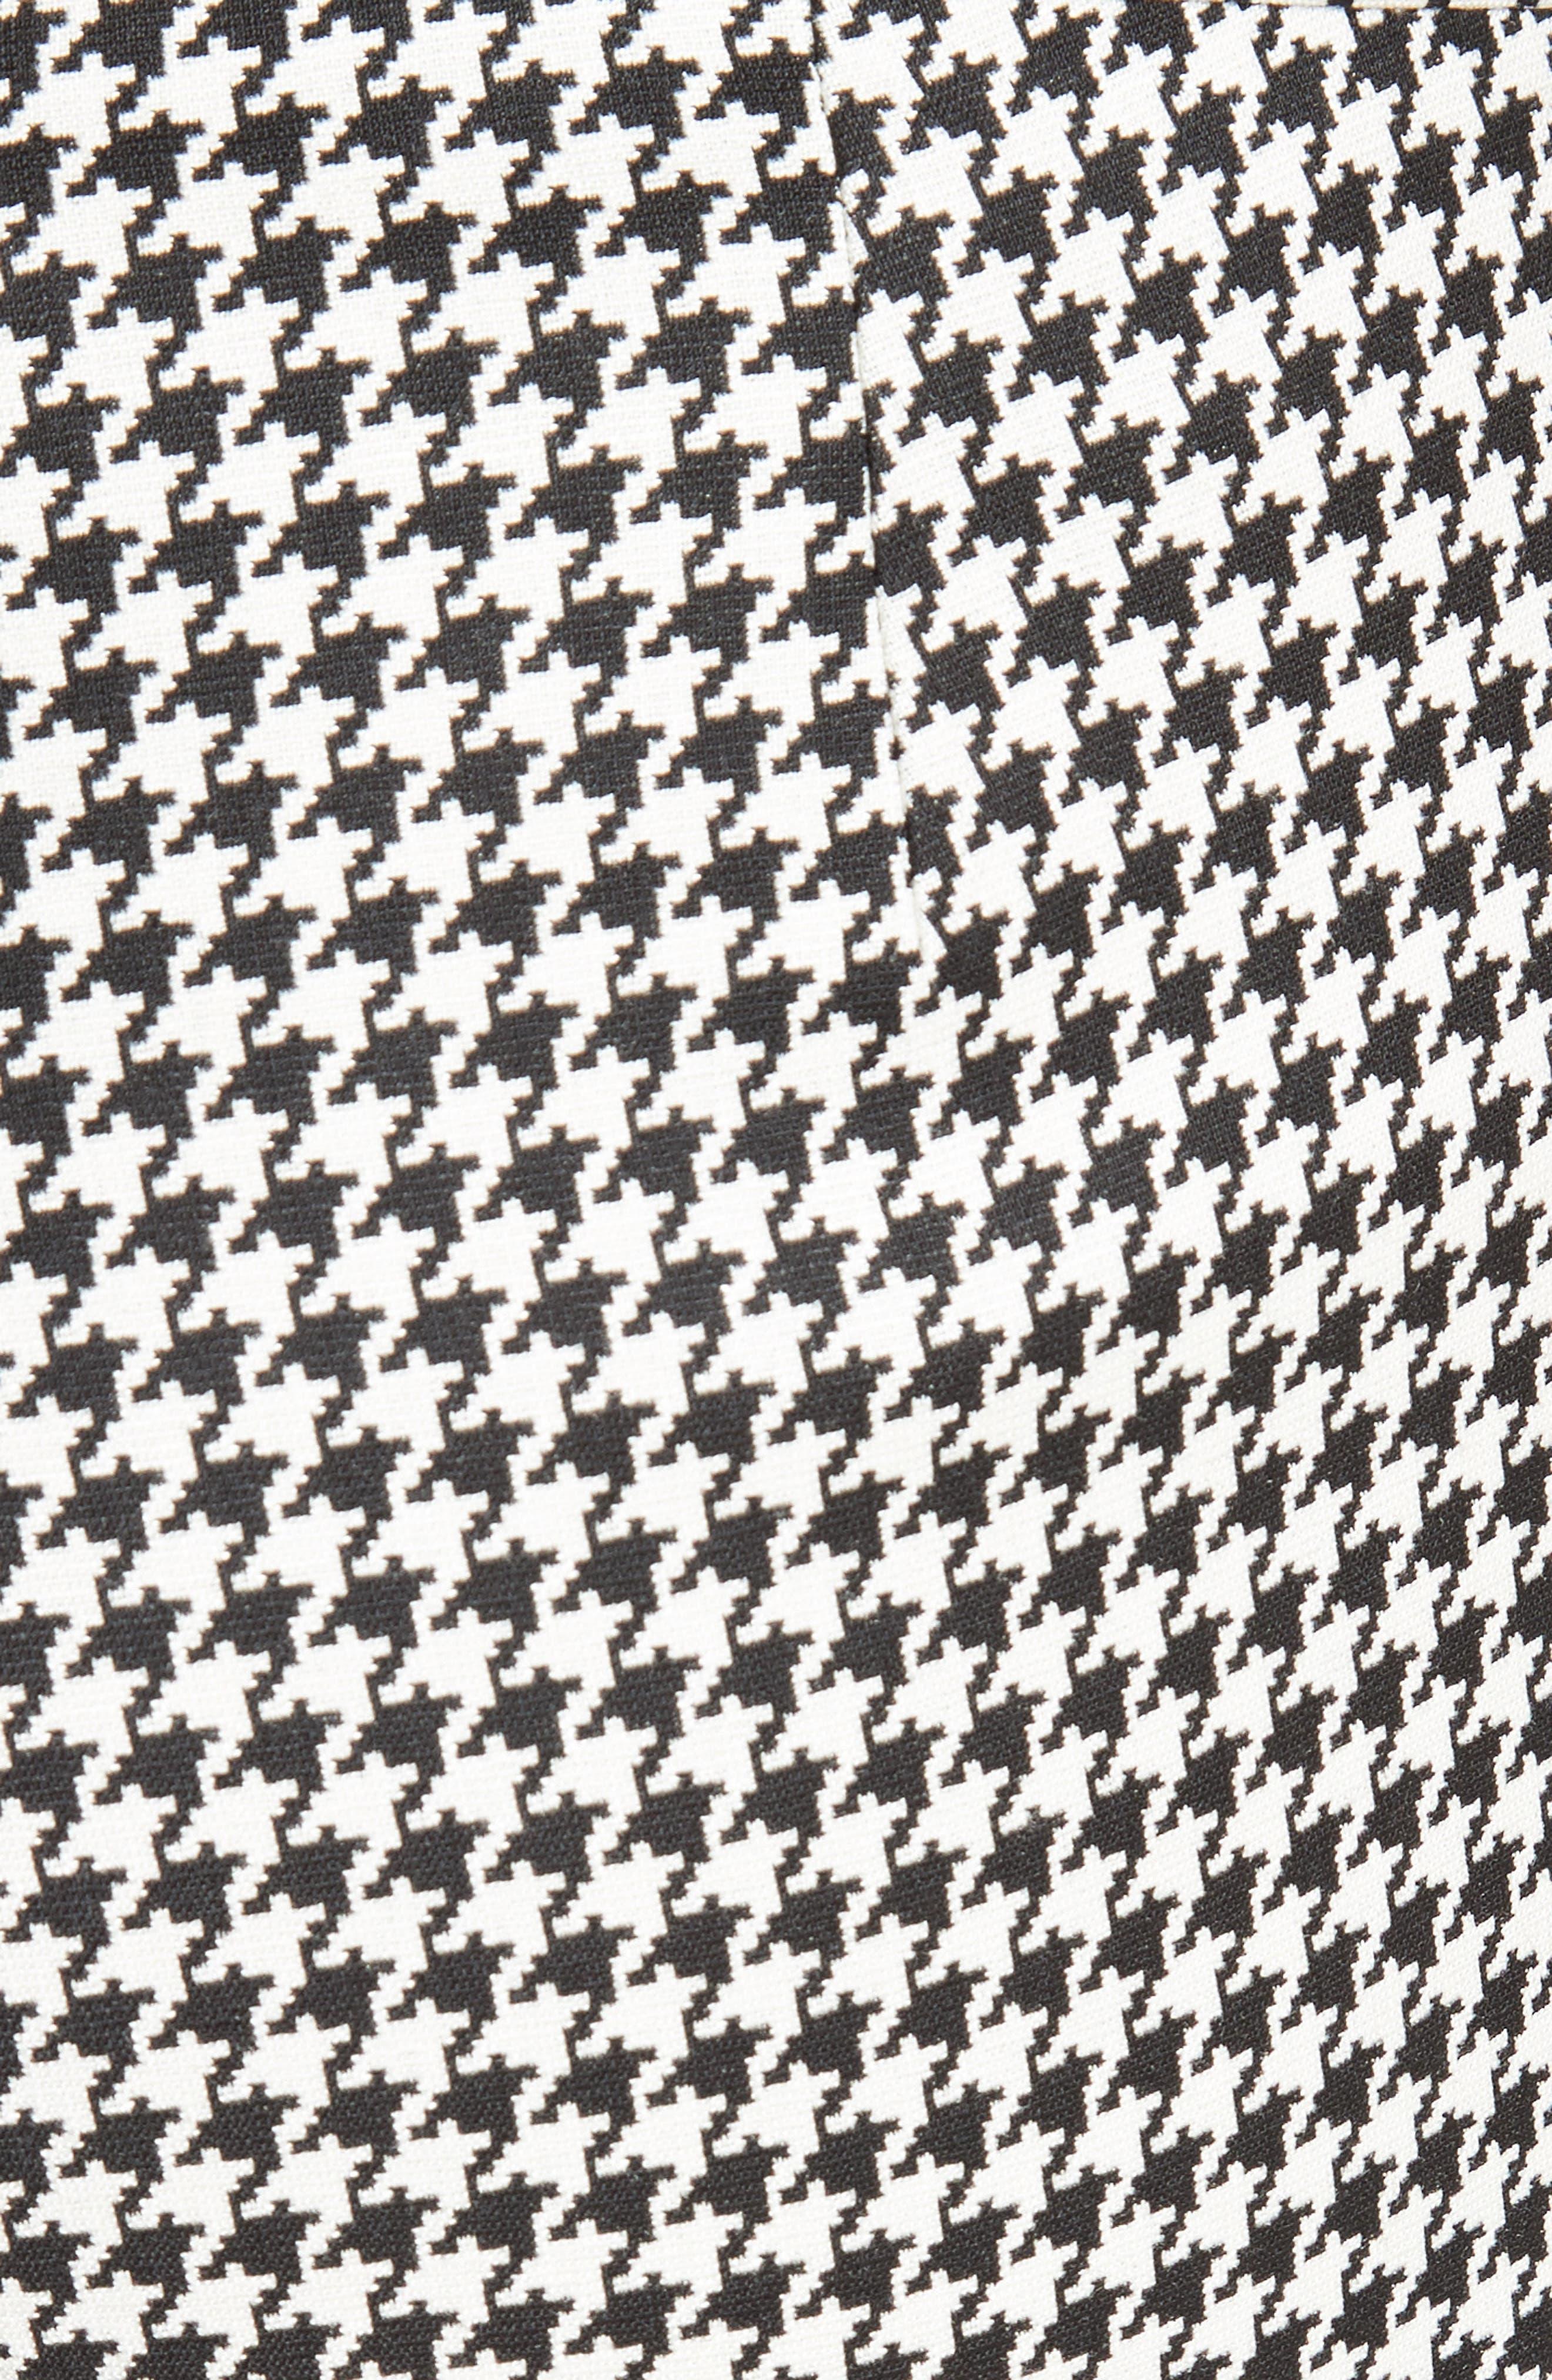 Astrale Houndstooth Wool Blend Pants,                             Alternate thumbnail 3, color,                             Black